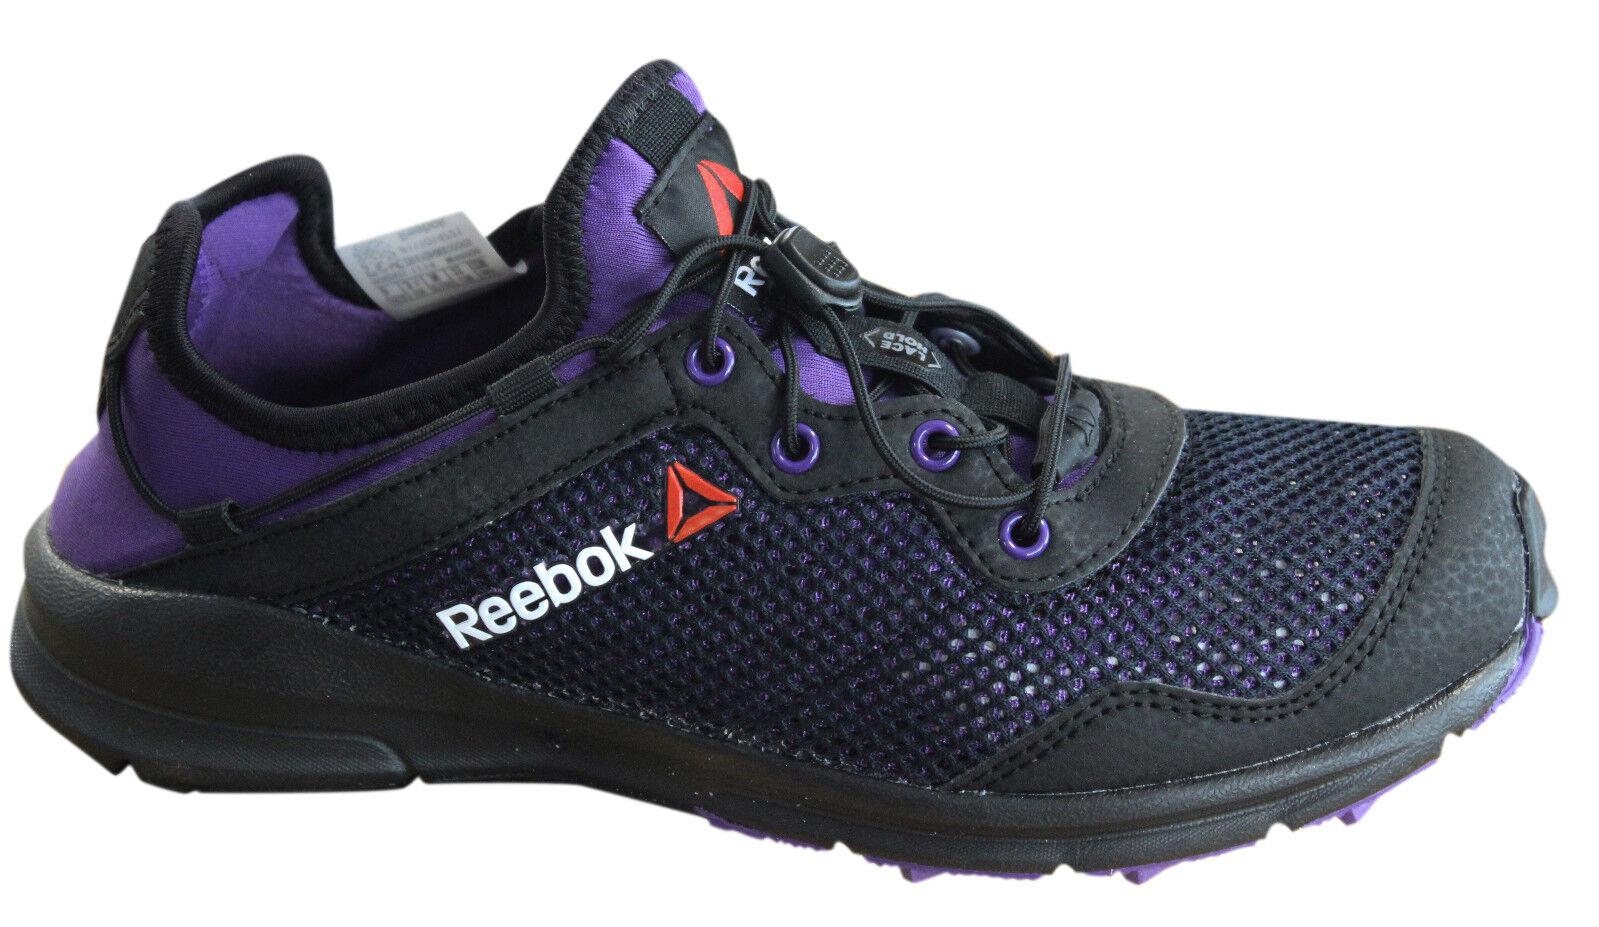 Reebok Trail uno Rush alternar Up Negro Púrpura Zapatillas para mujer M44998 P6